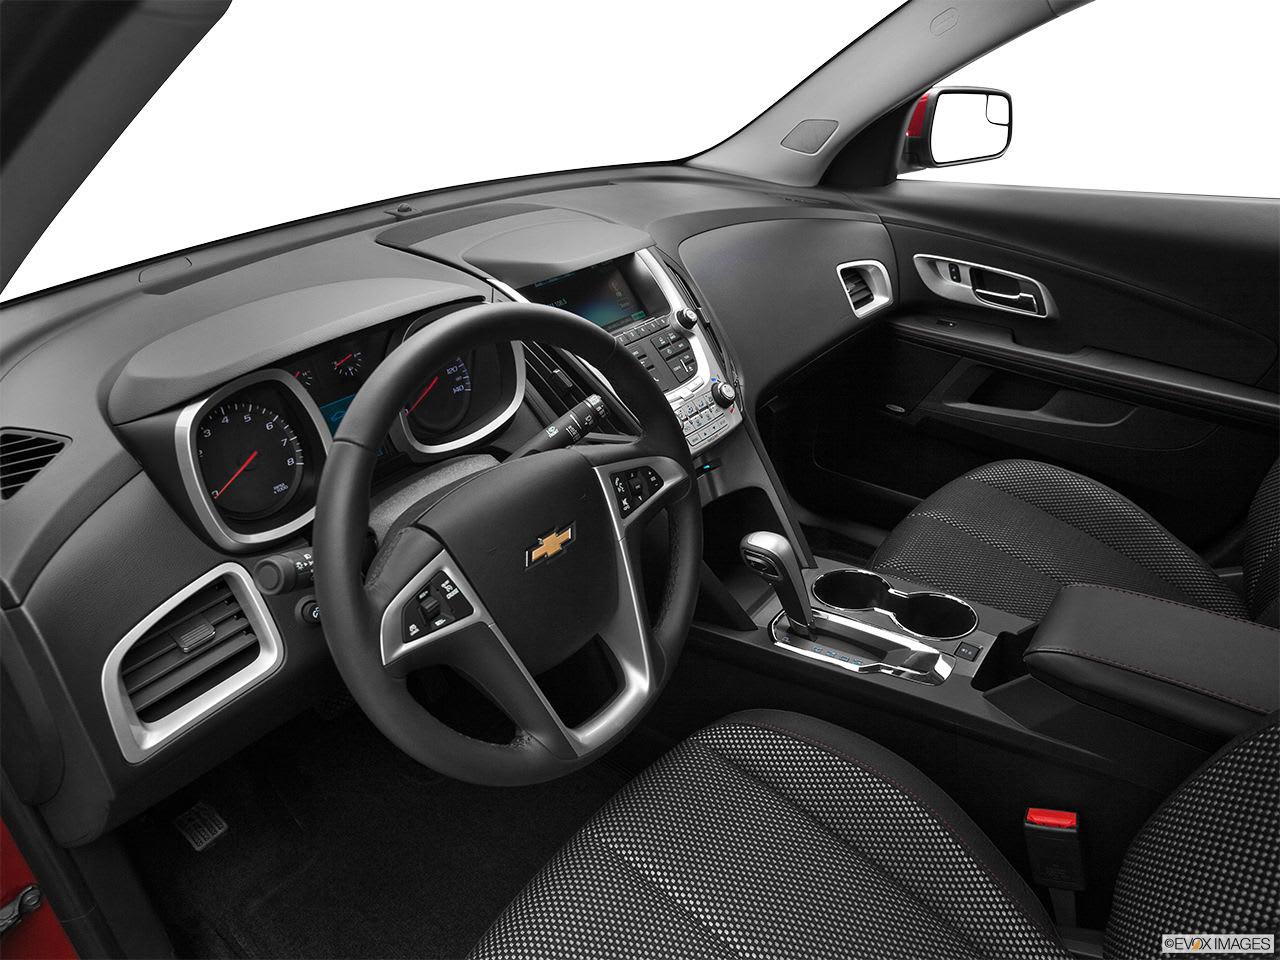 Chevrolet Equinox 2012 Interior